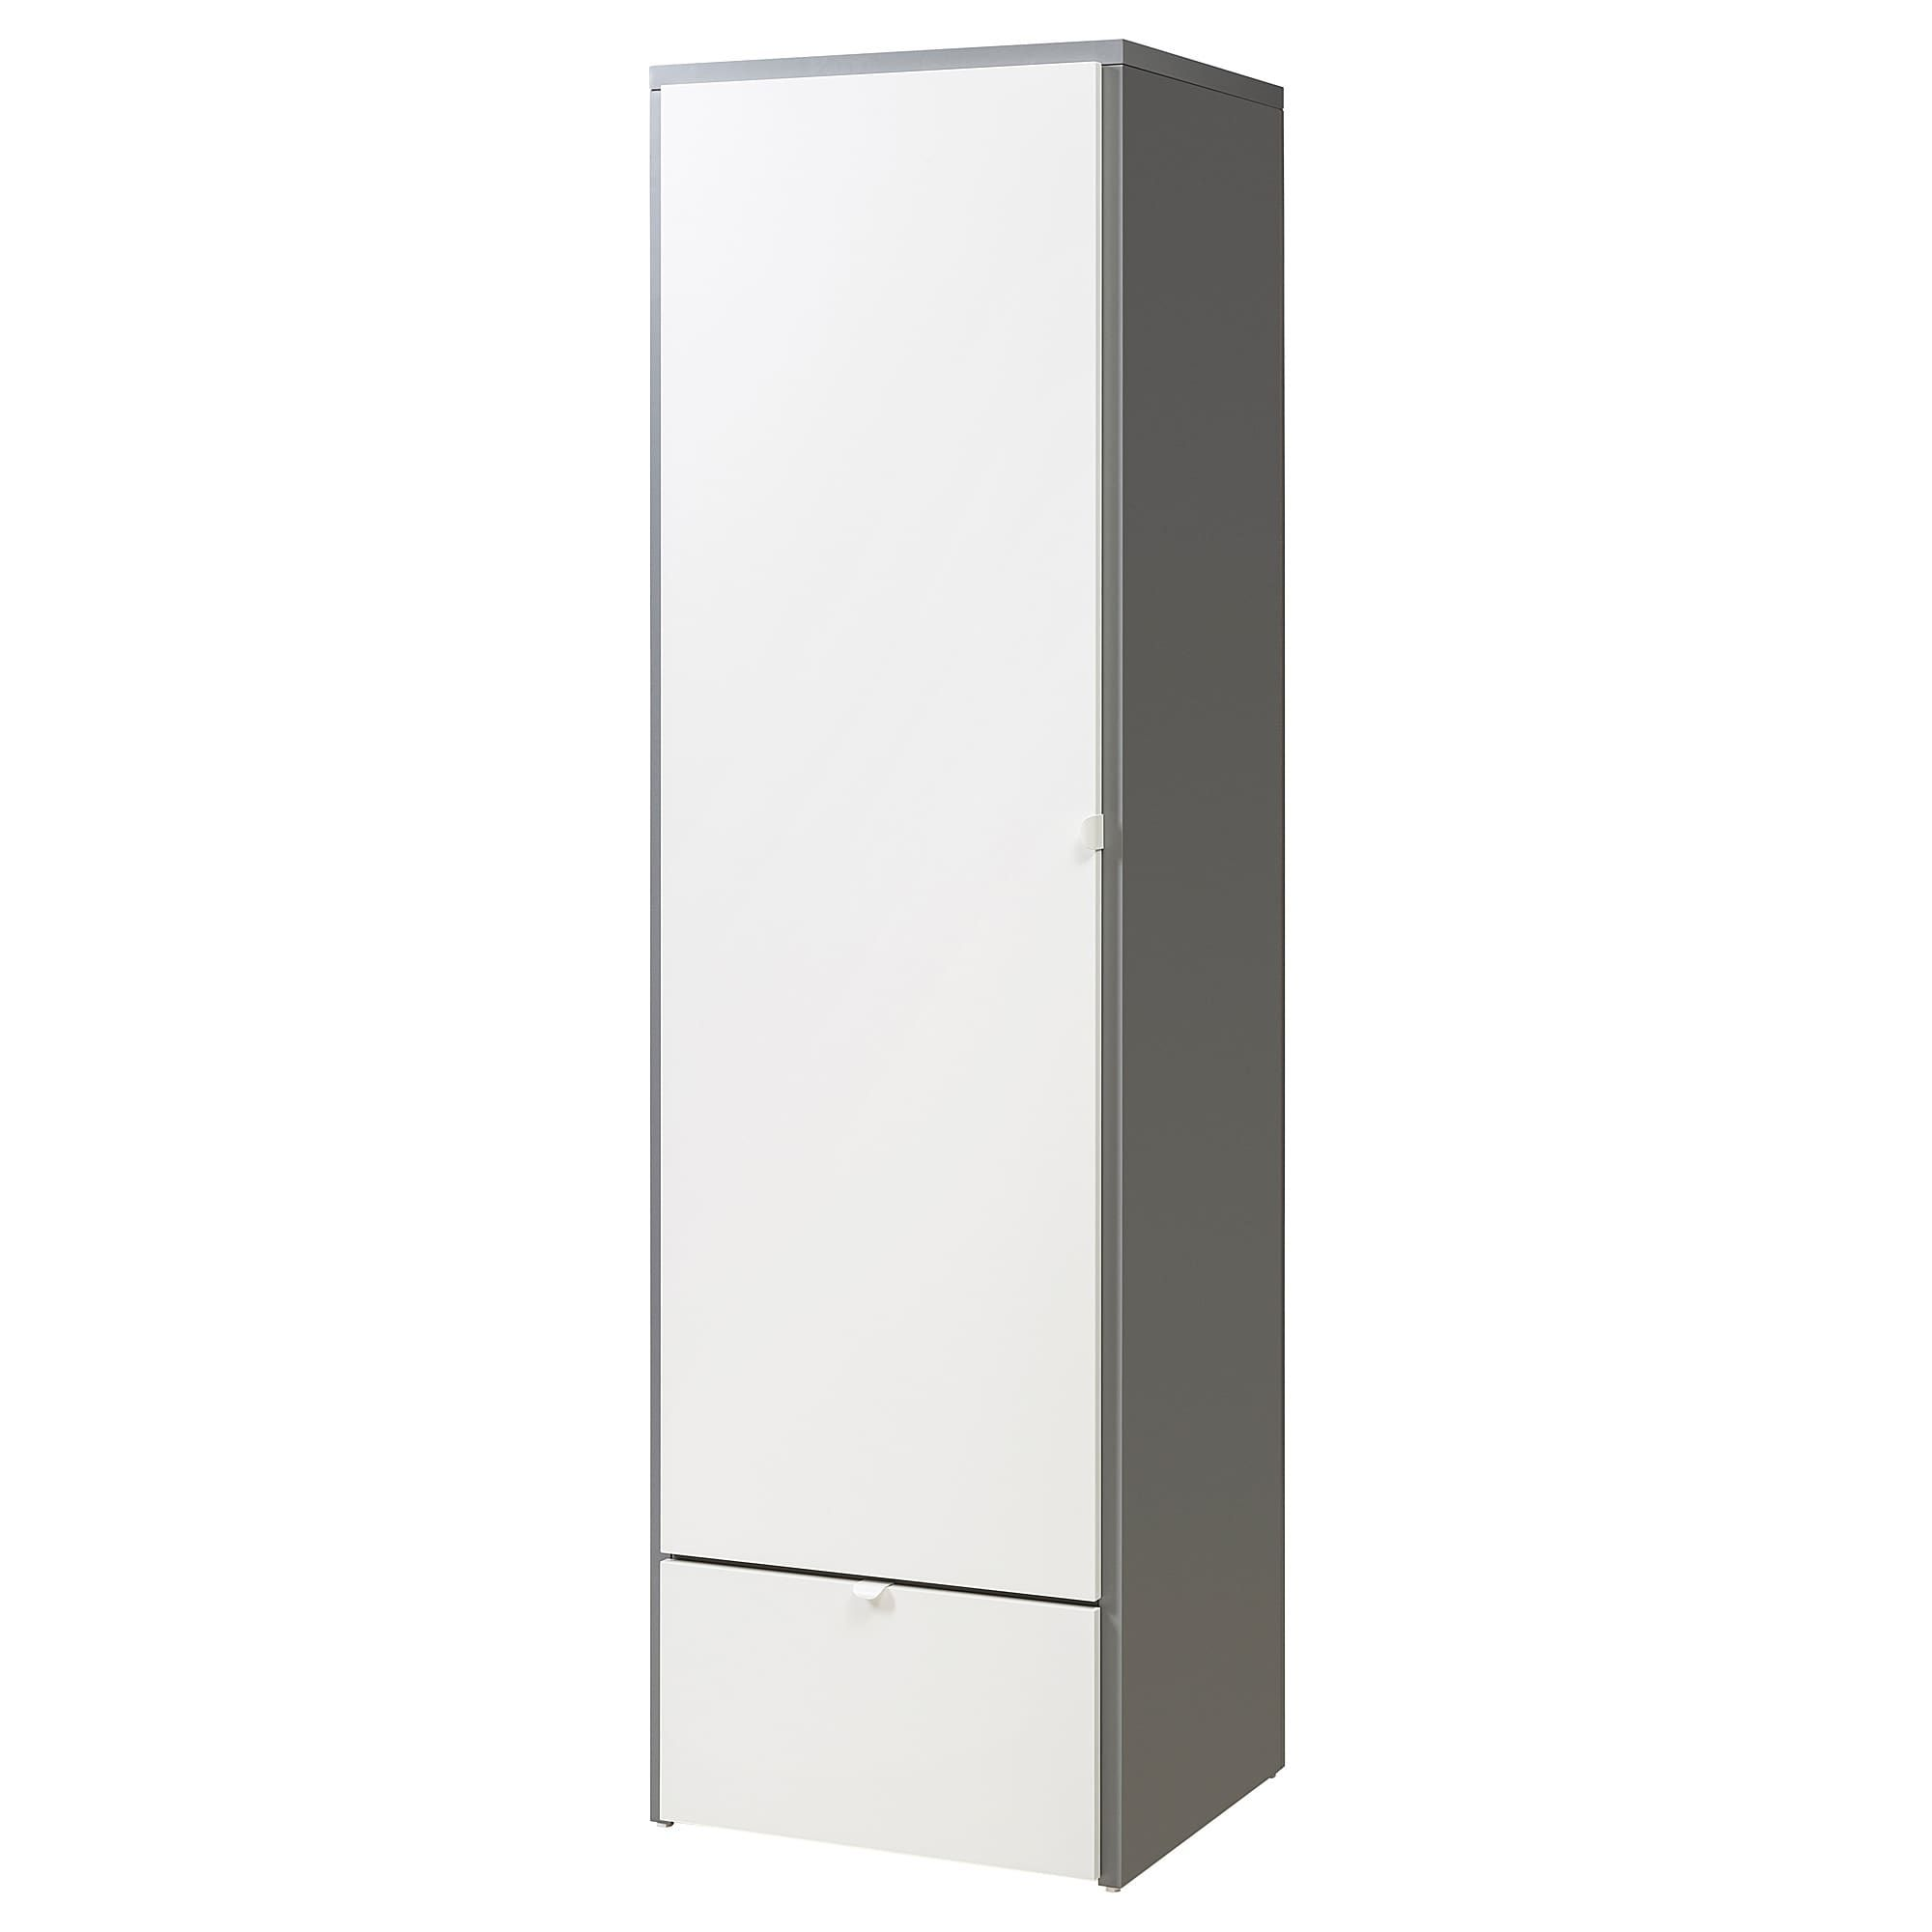 Visthus Kleiderschrank Grau Weiss In 2019 Products Ikea Wardrobe